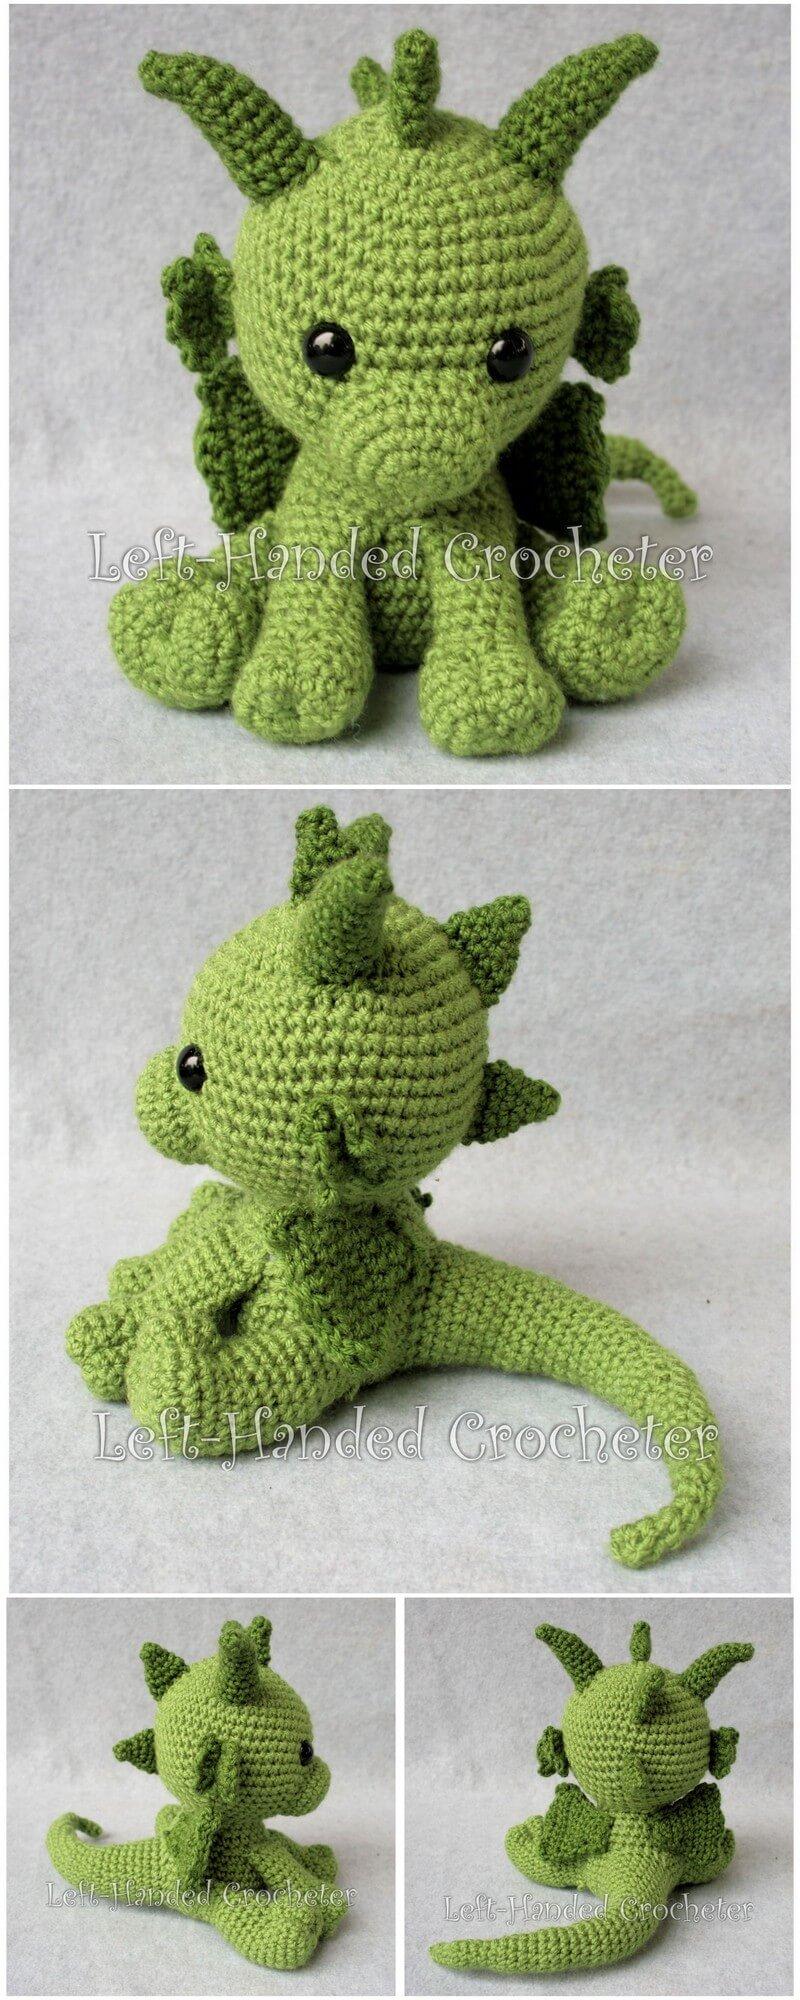 Free Crochet Amigurumi Pattern (12)